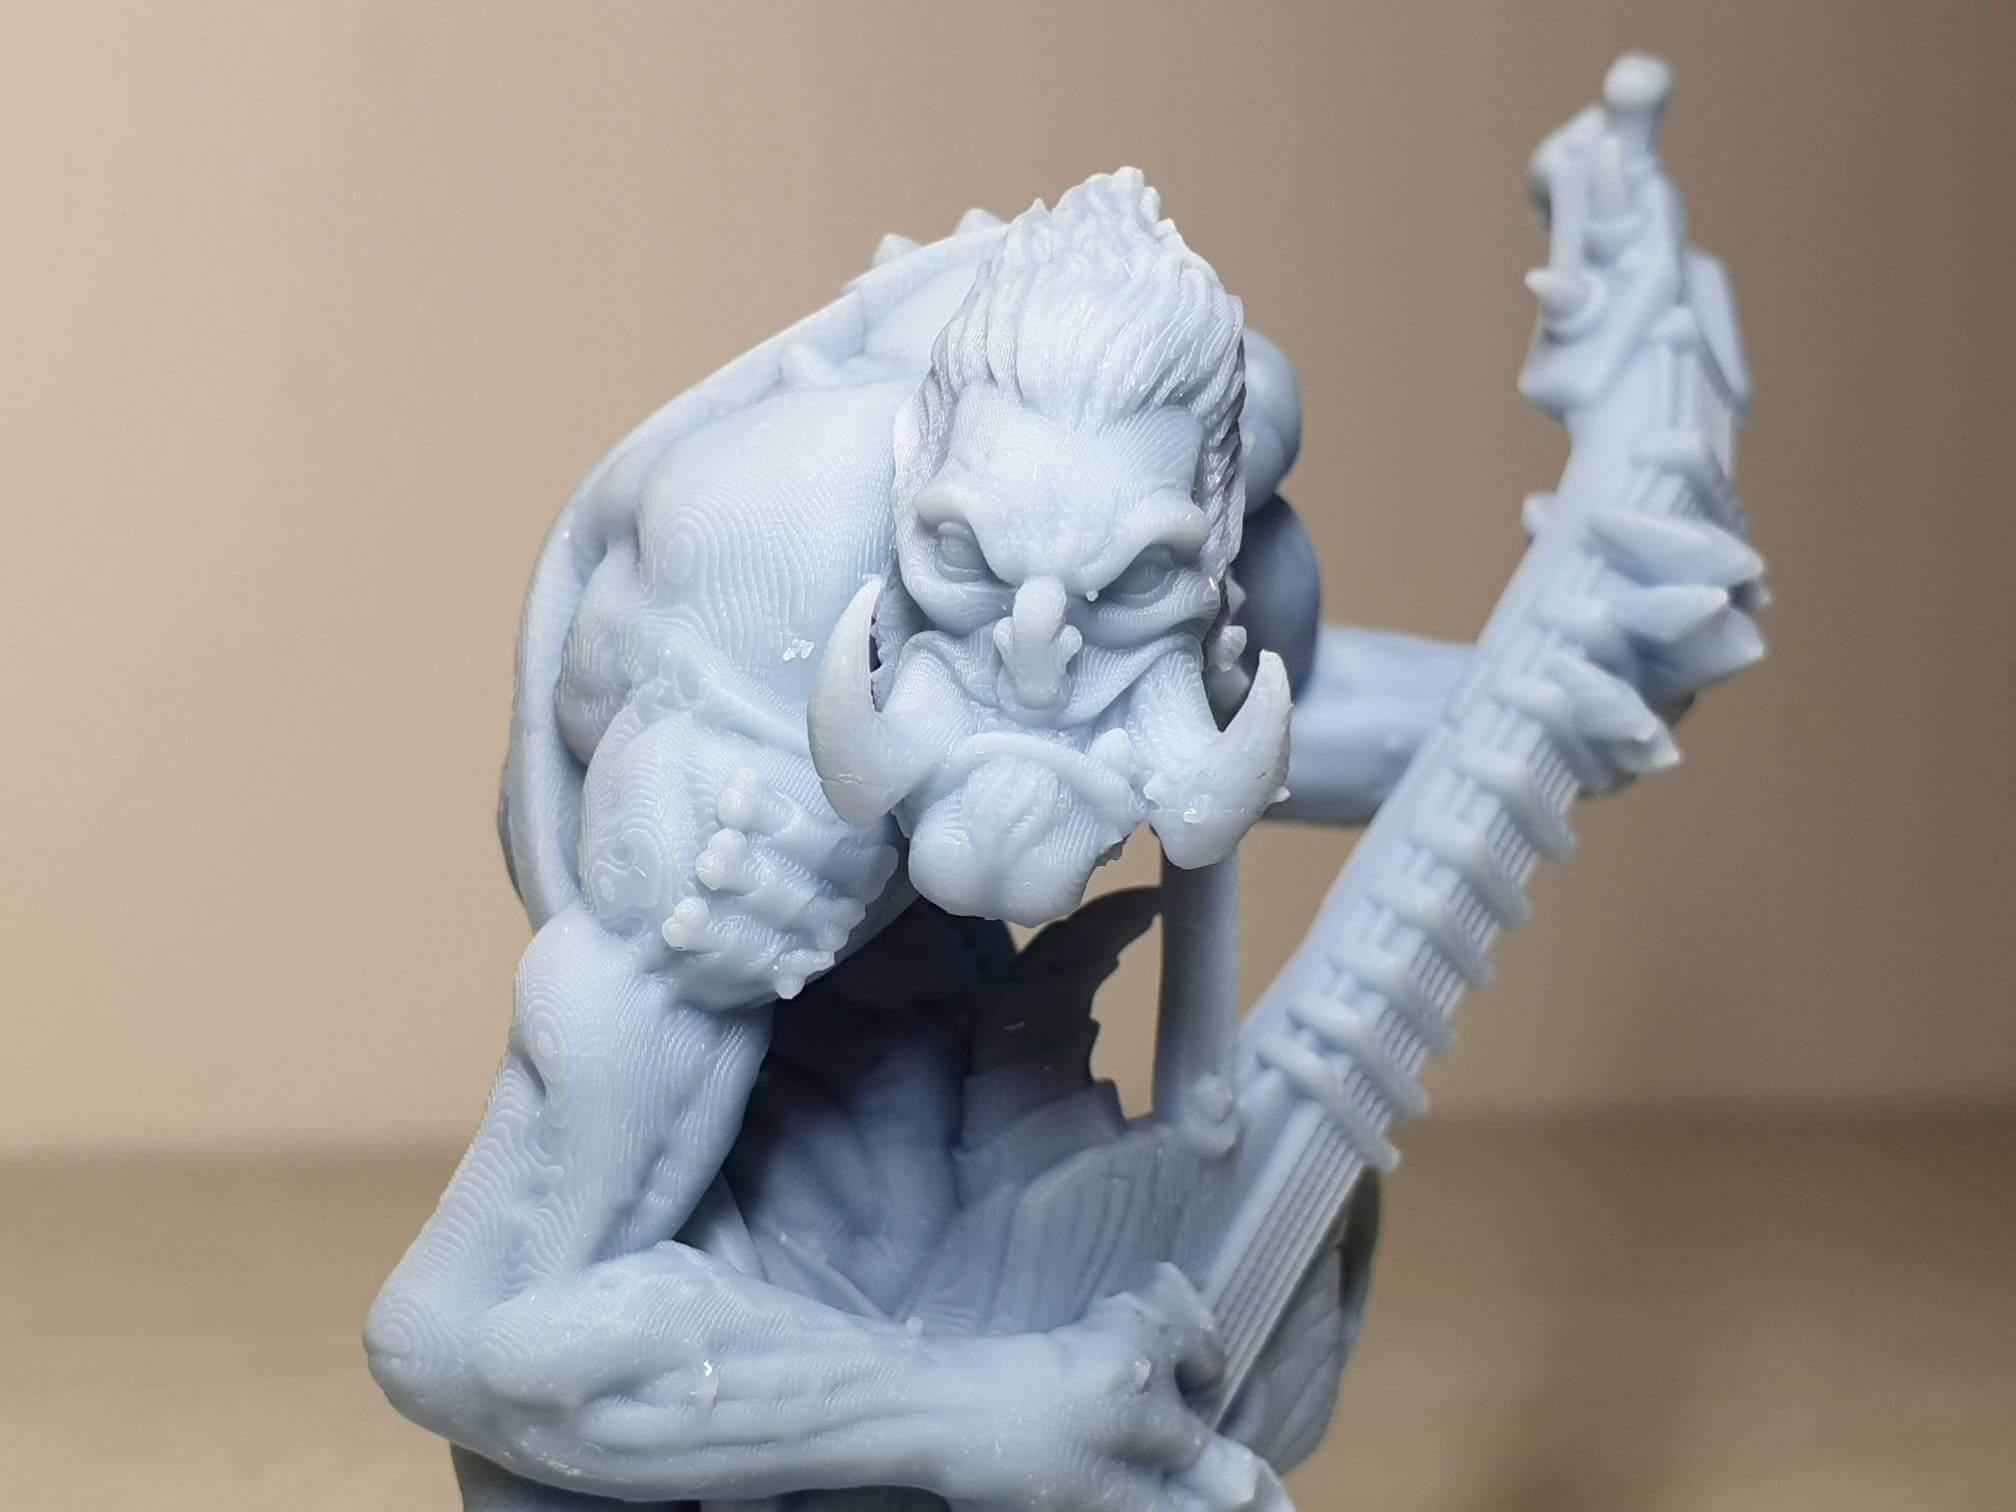 Gunlutt the Troll Guitarist Budget Resin Printer 6   Anycubic Photon Zero Review - Budget Resin Printer